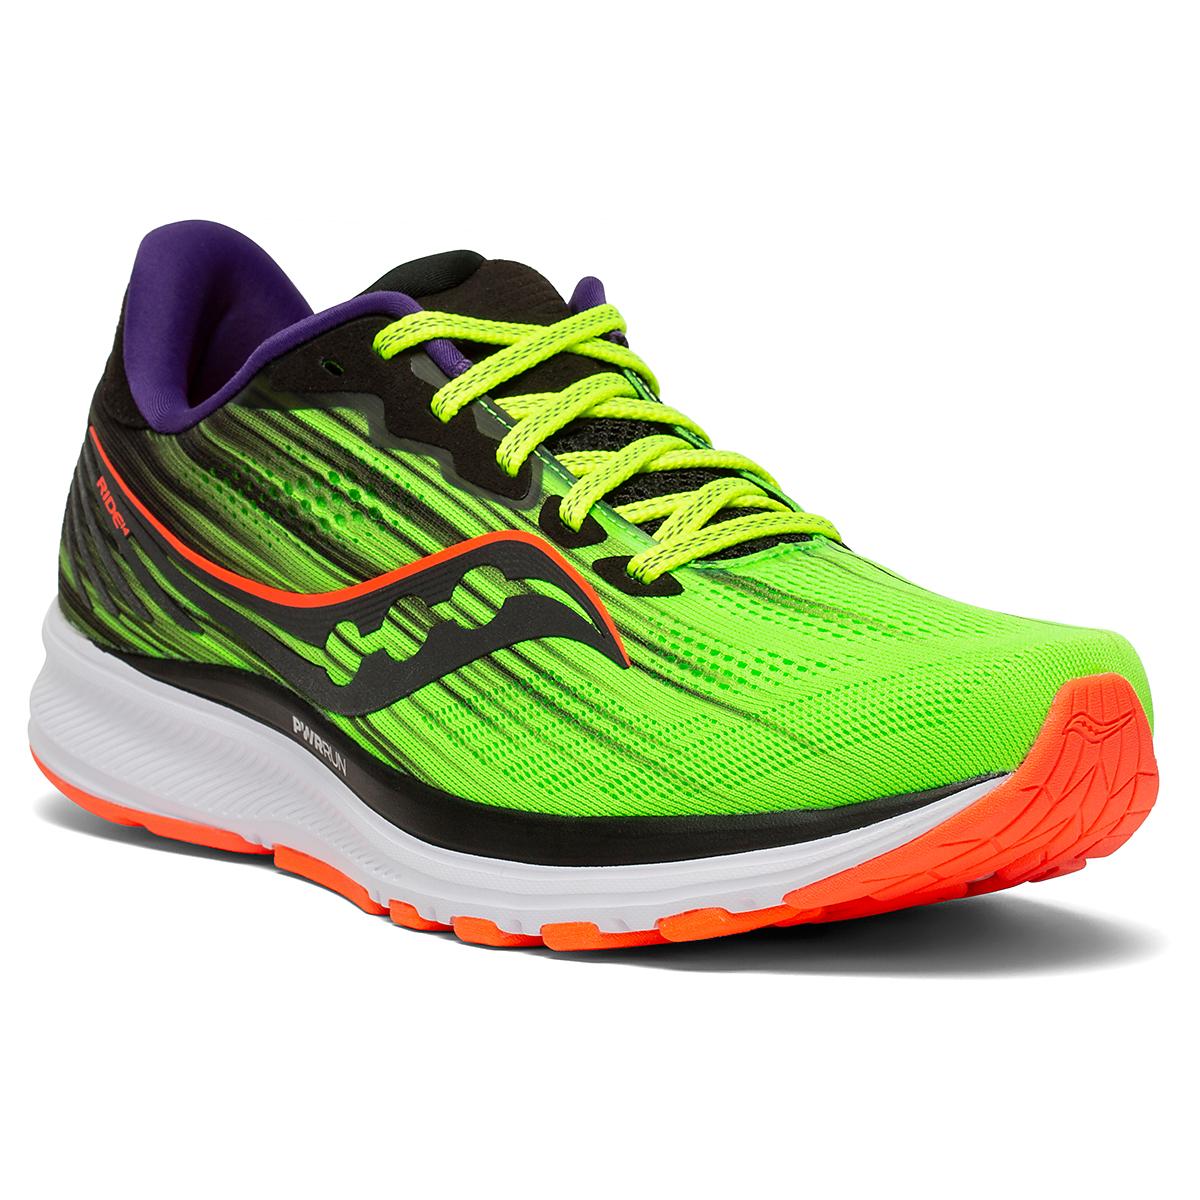 Men's Saucony Ride 14 Running Shoe - Color: Vizipro - Size: 7 - Width: Regular, Vizipro, large, image 5